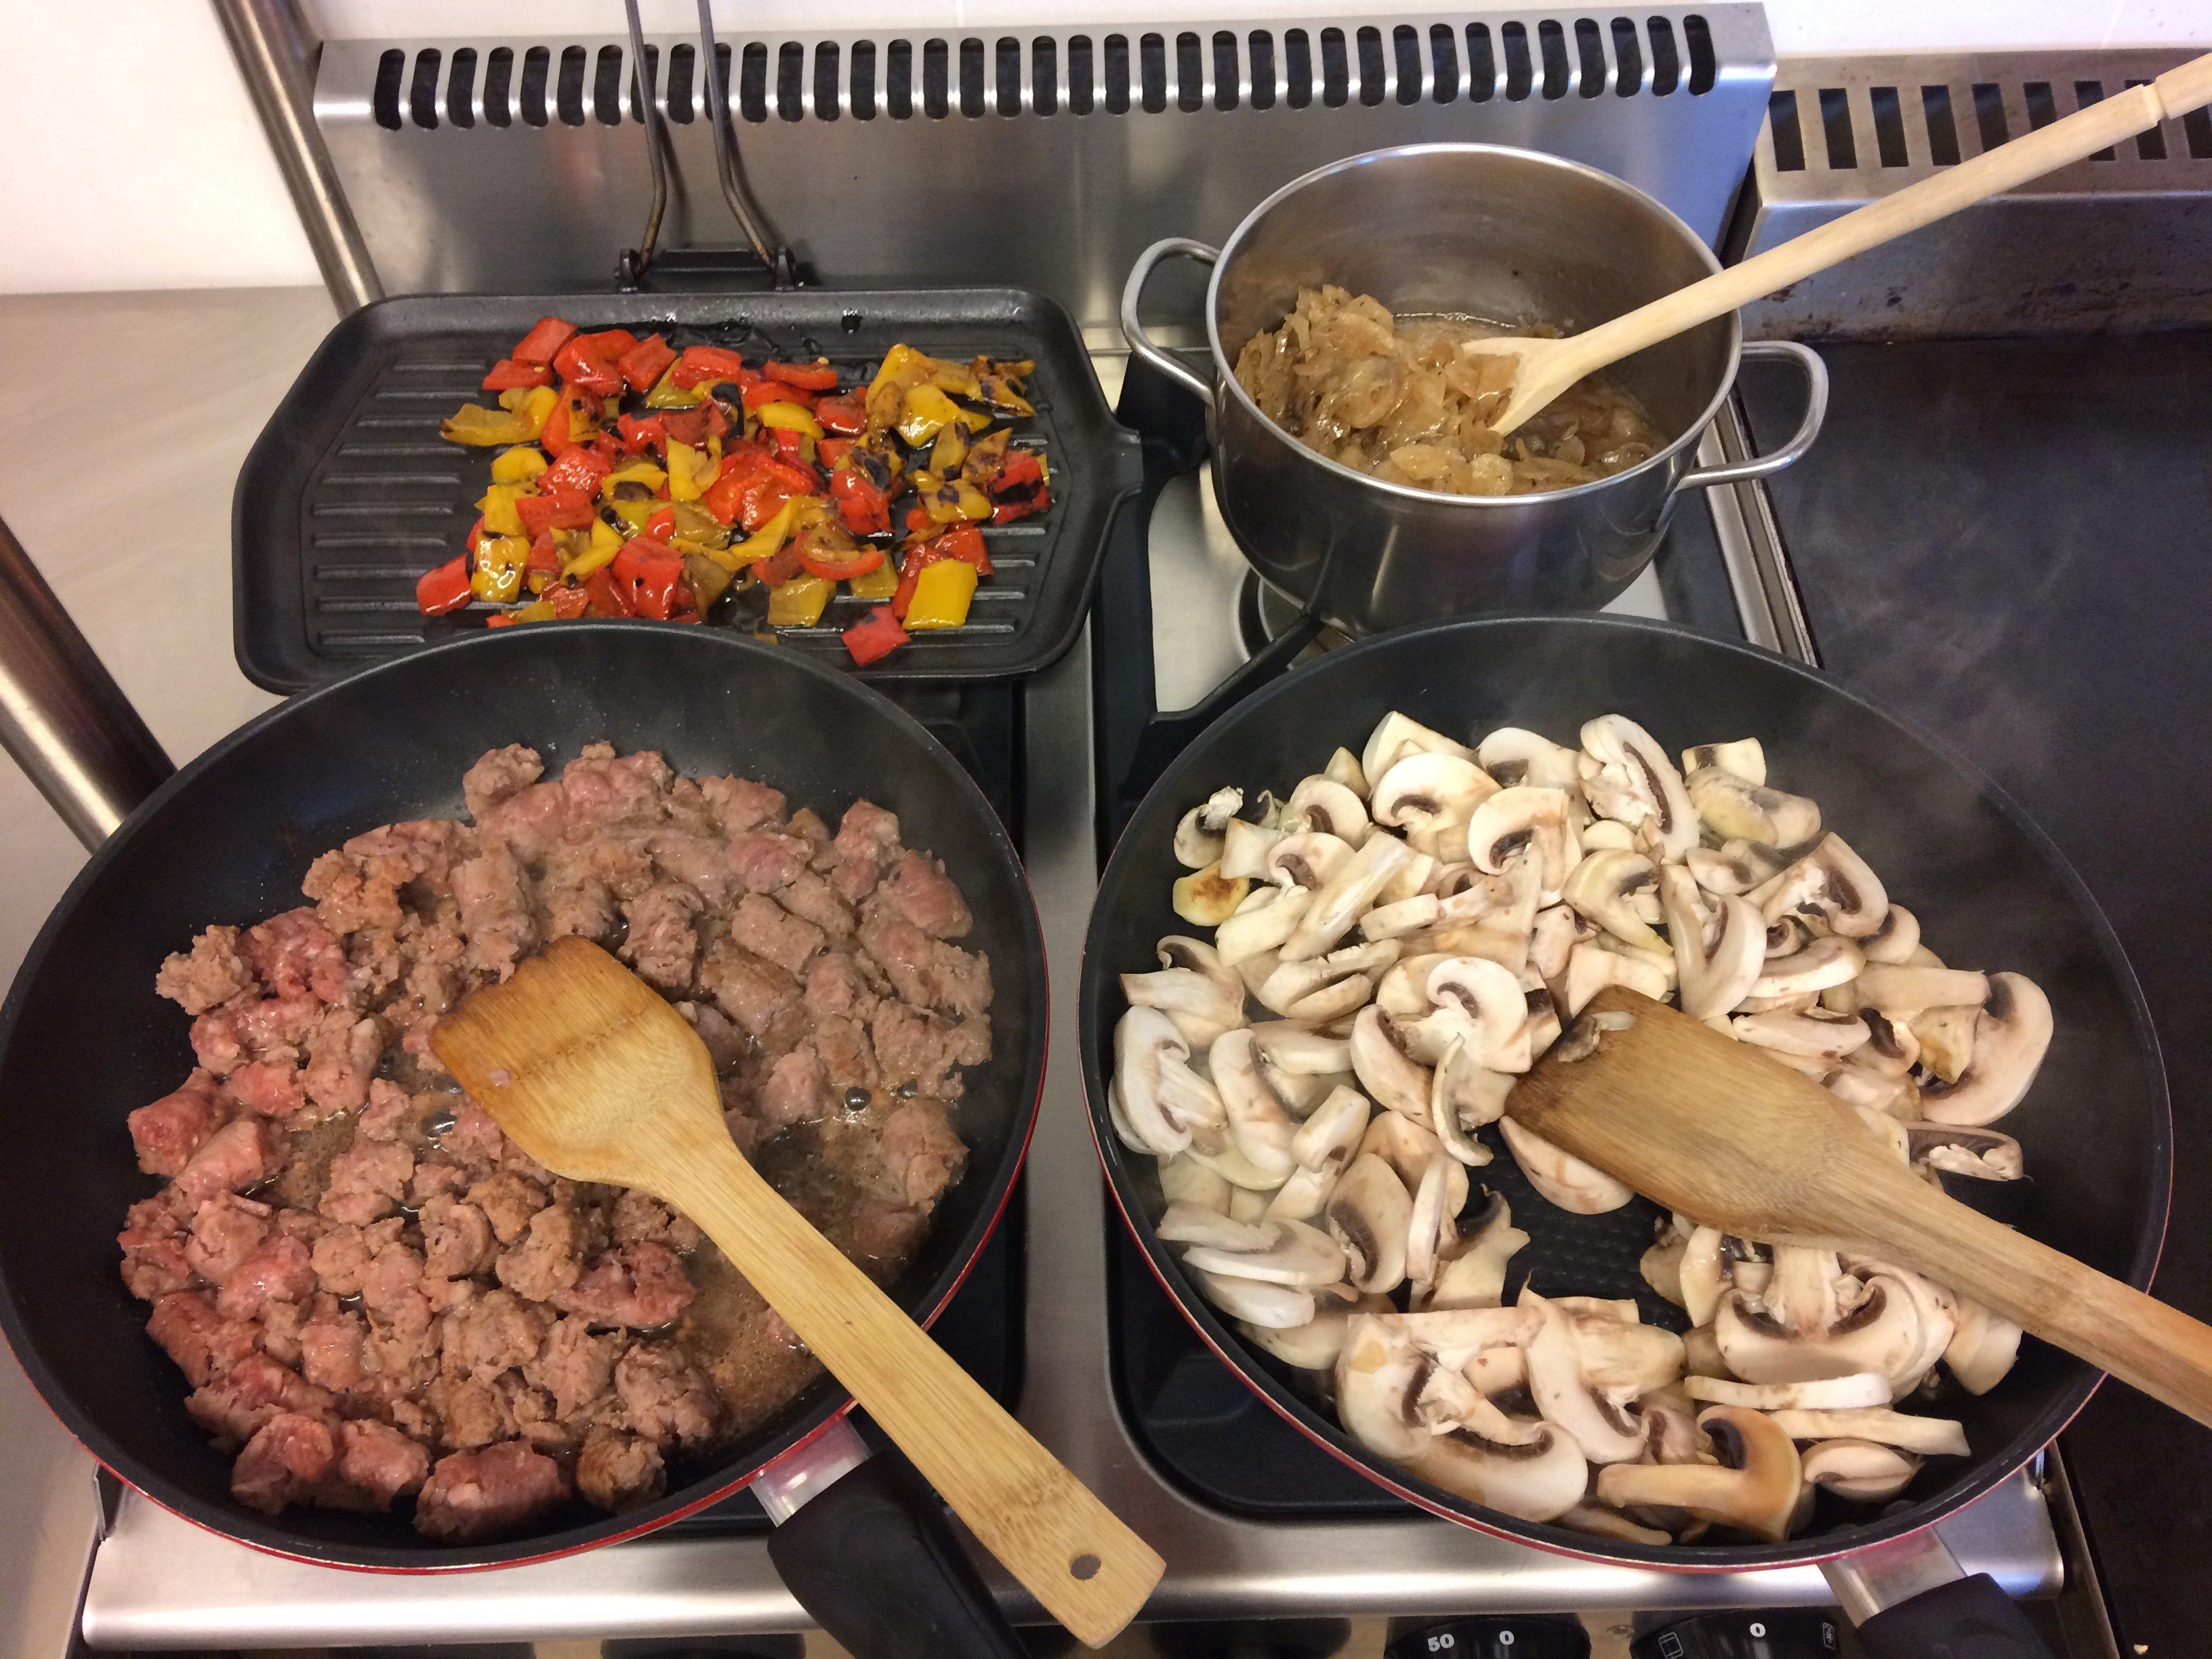 Ingredienti freschi cucinati per preparare la piadina